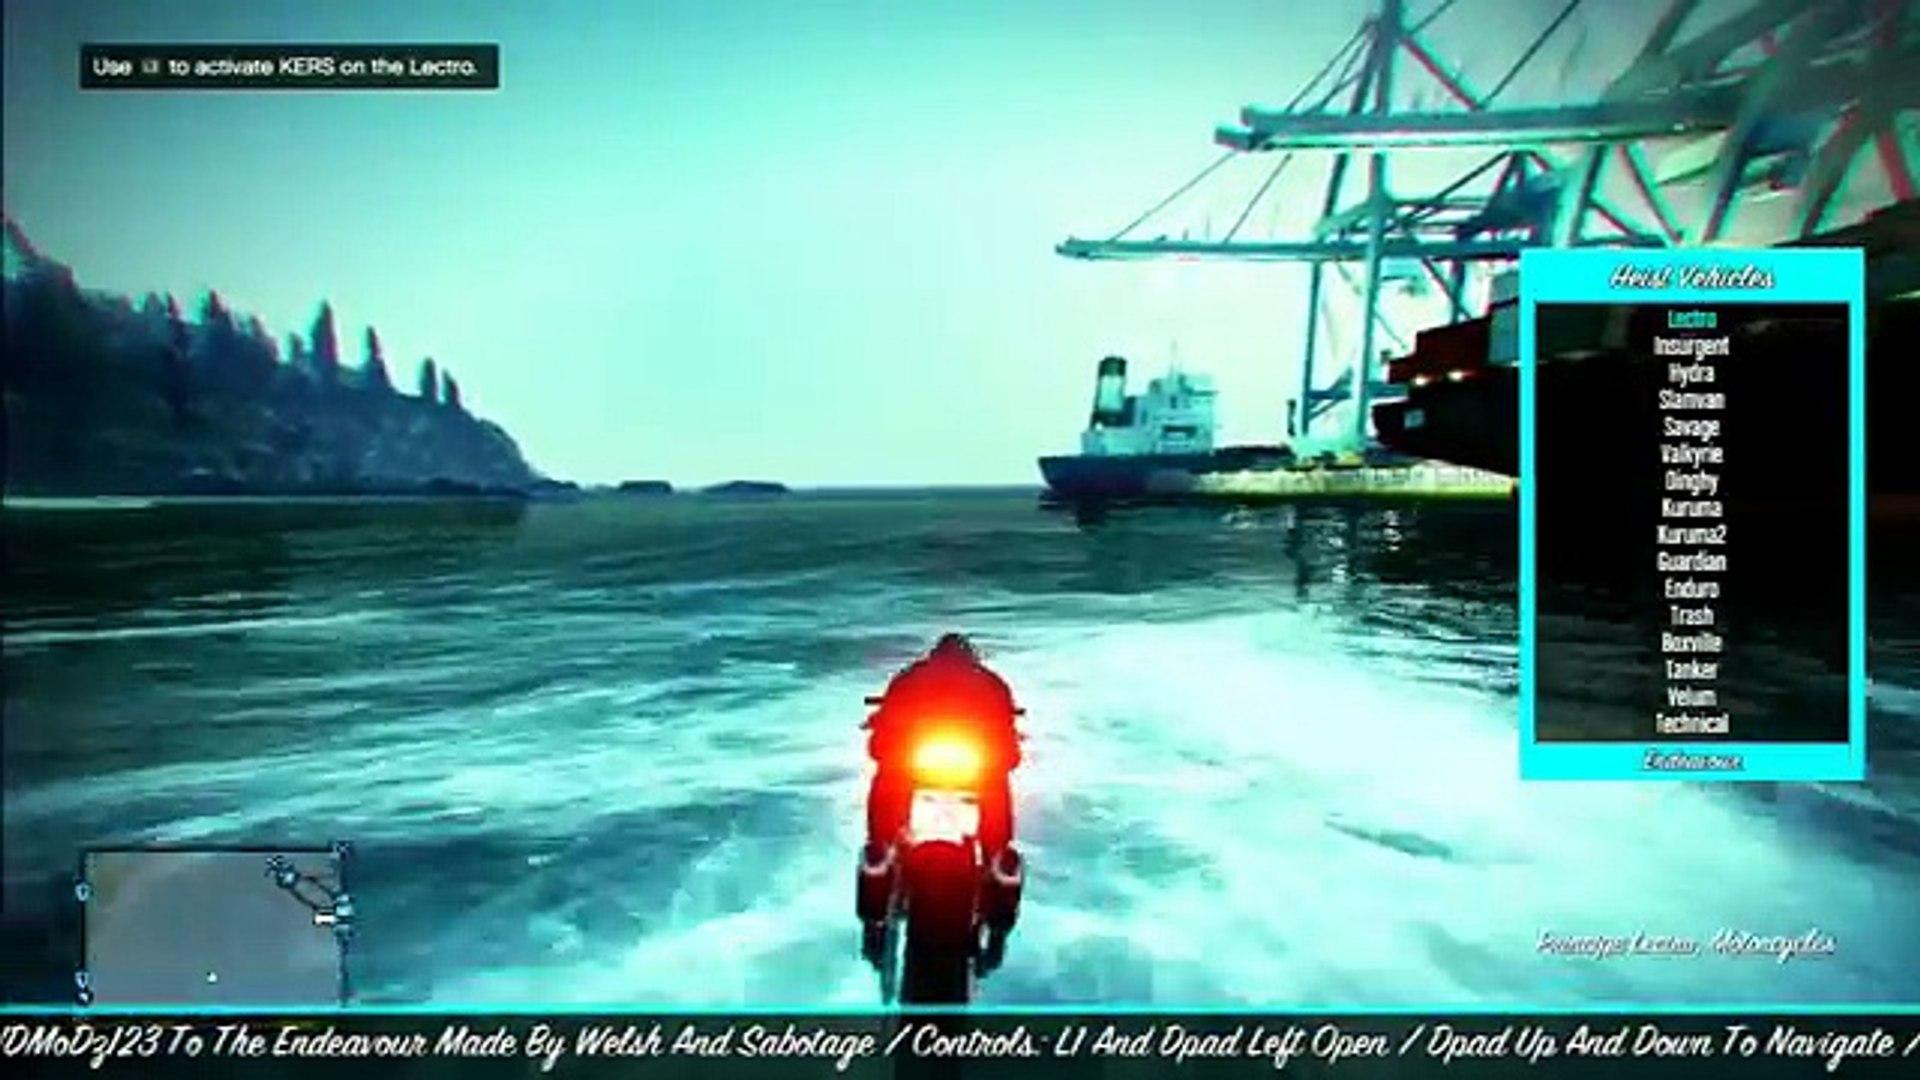 PS3] How To Install GTA 5 Mod Menus NO JAILBREAK! PS3 OFW! (GTA 5 Mod Menu  Tutorial) - video dailymotion